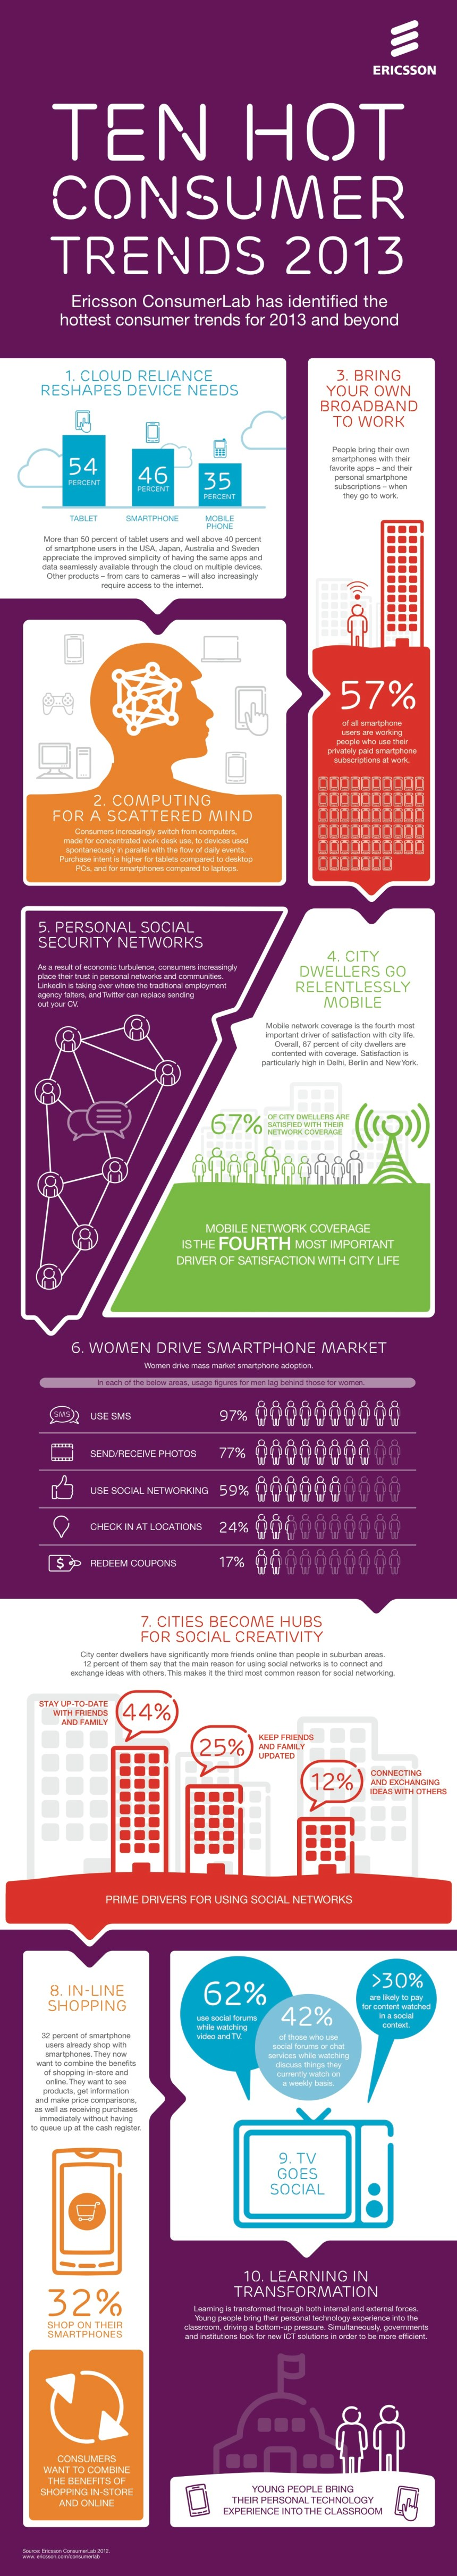 10 tendencias tecnológicas para 2013